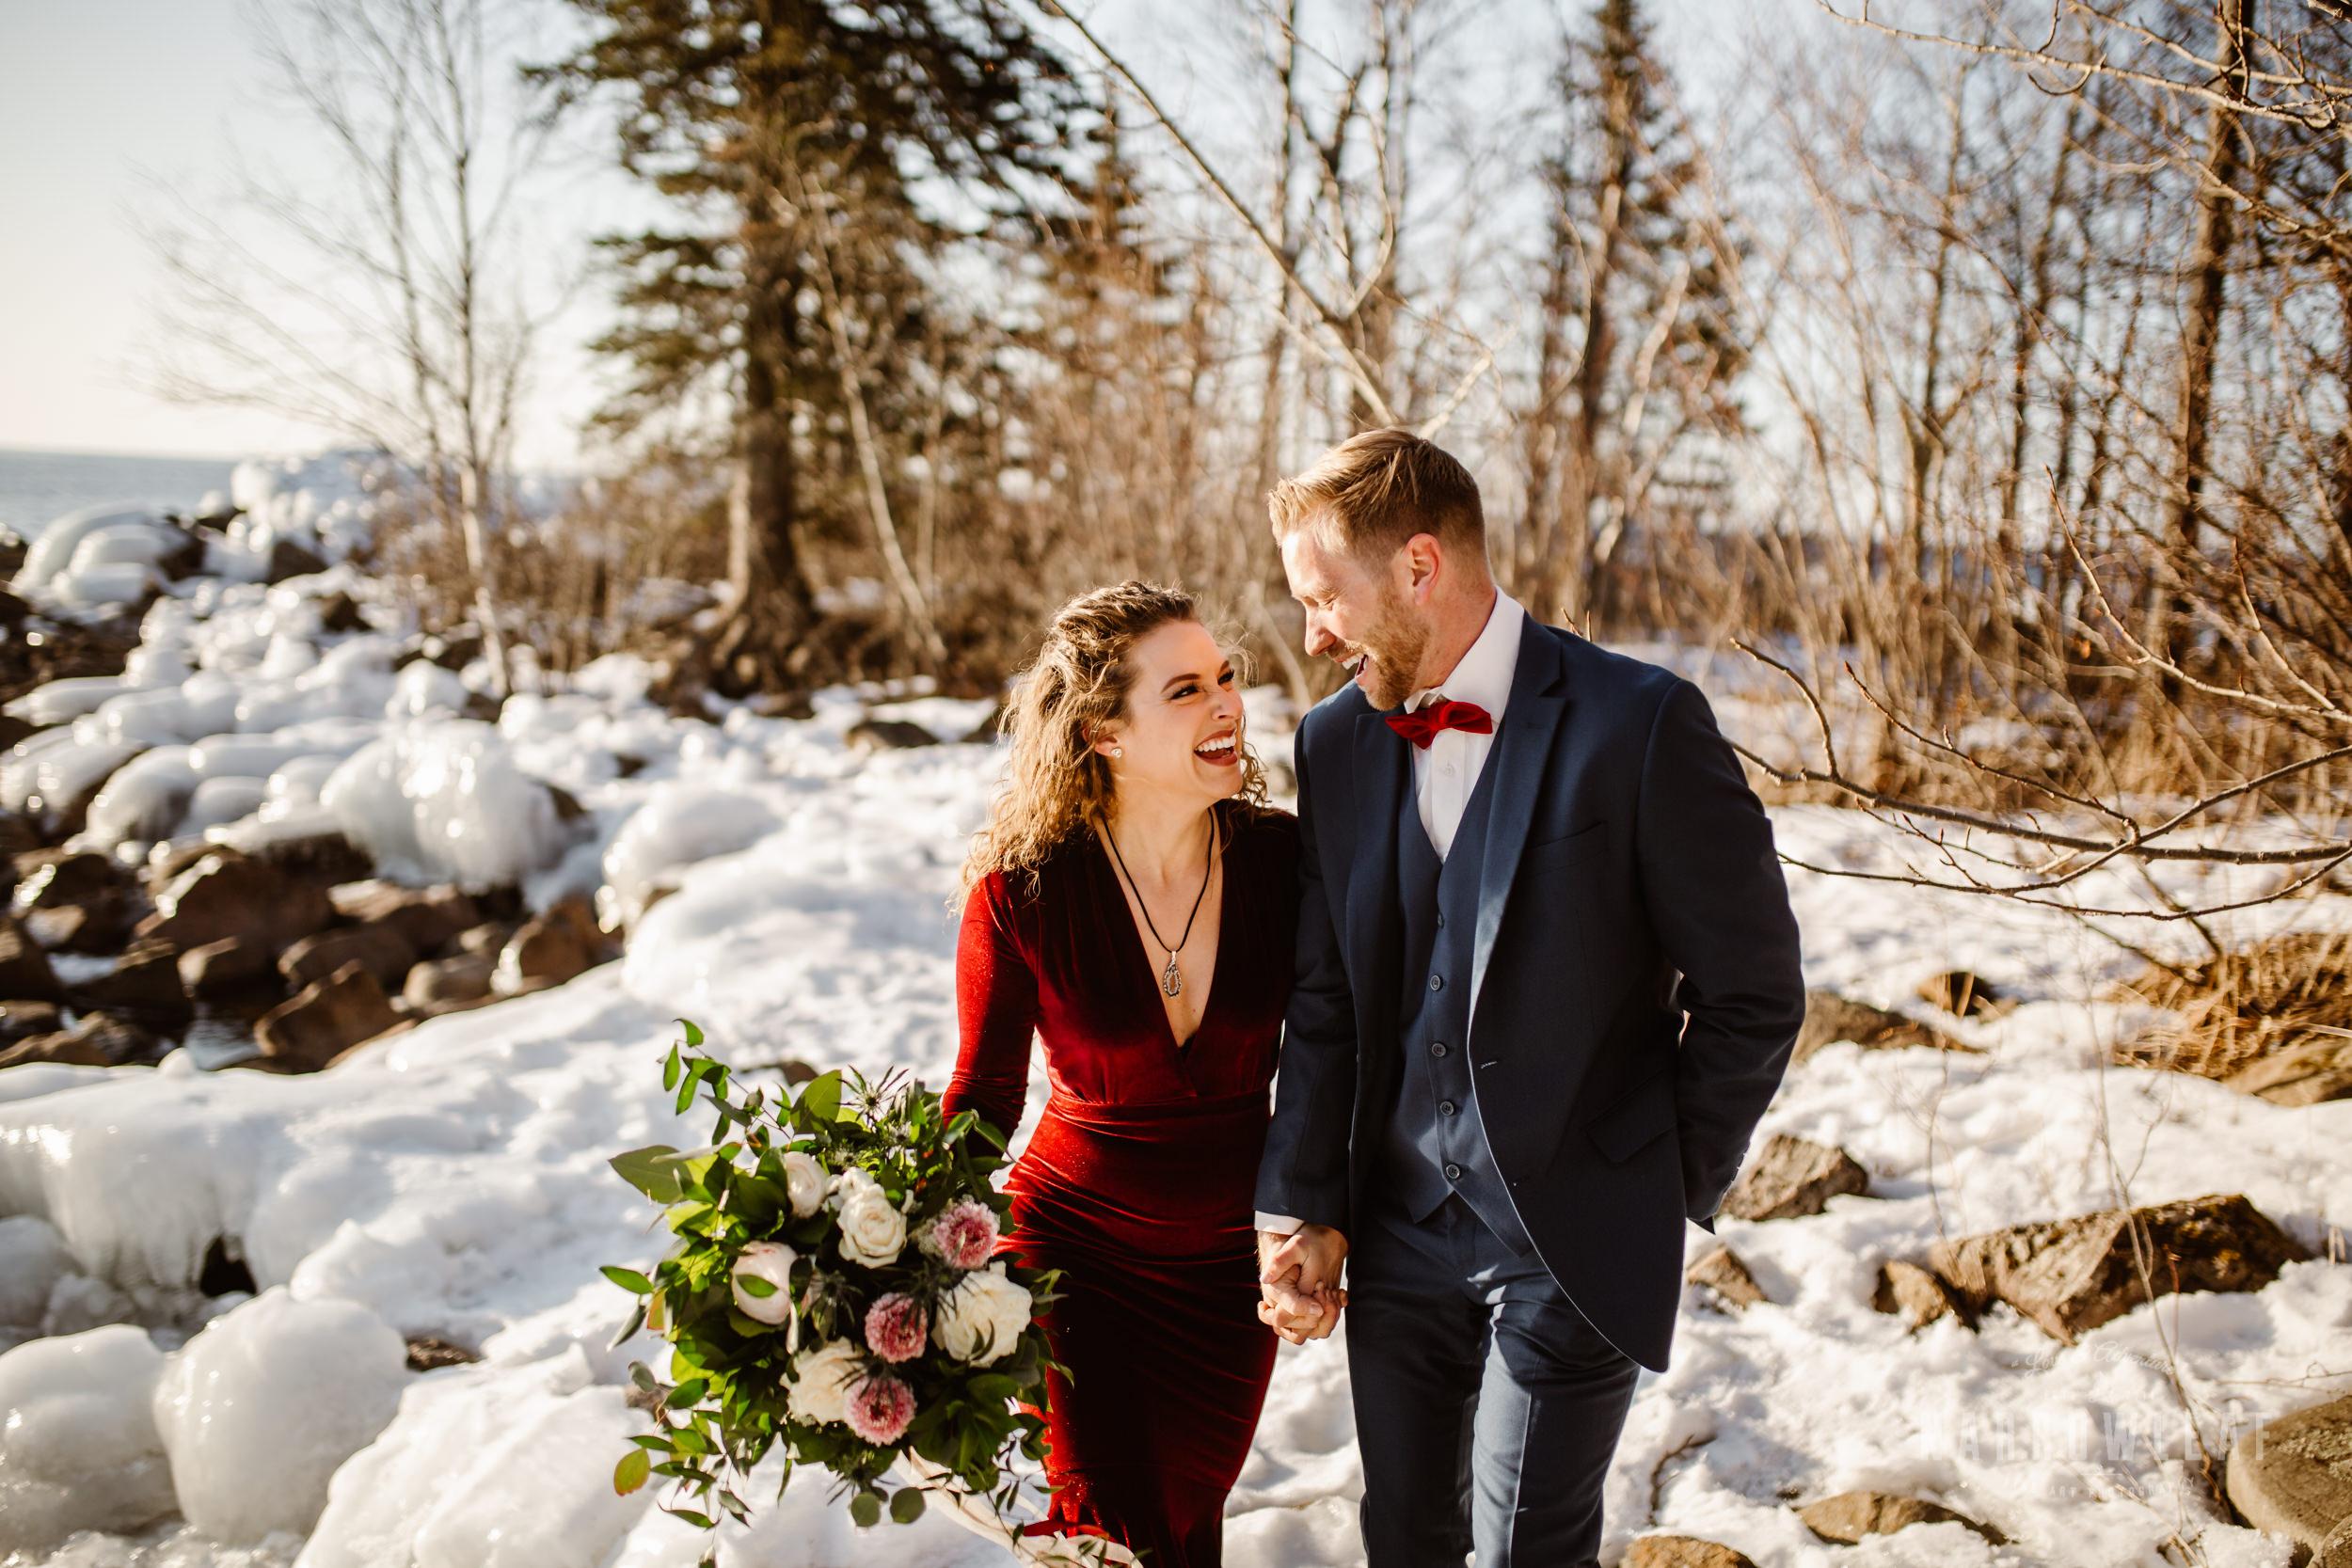 winter-adventure-elopement-tettegouche-state-park-minnesota-Narrowleaf_Love_and_Adventure_Photography-8702.jpg